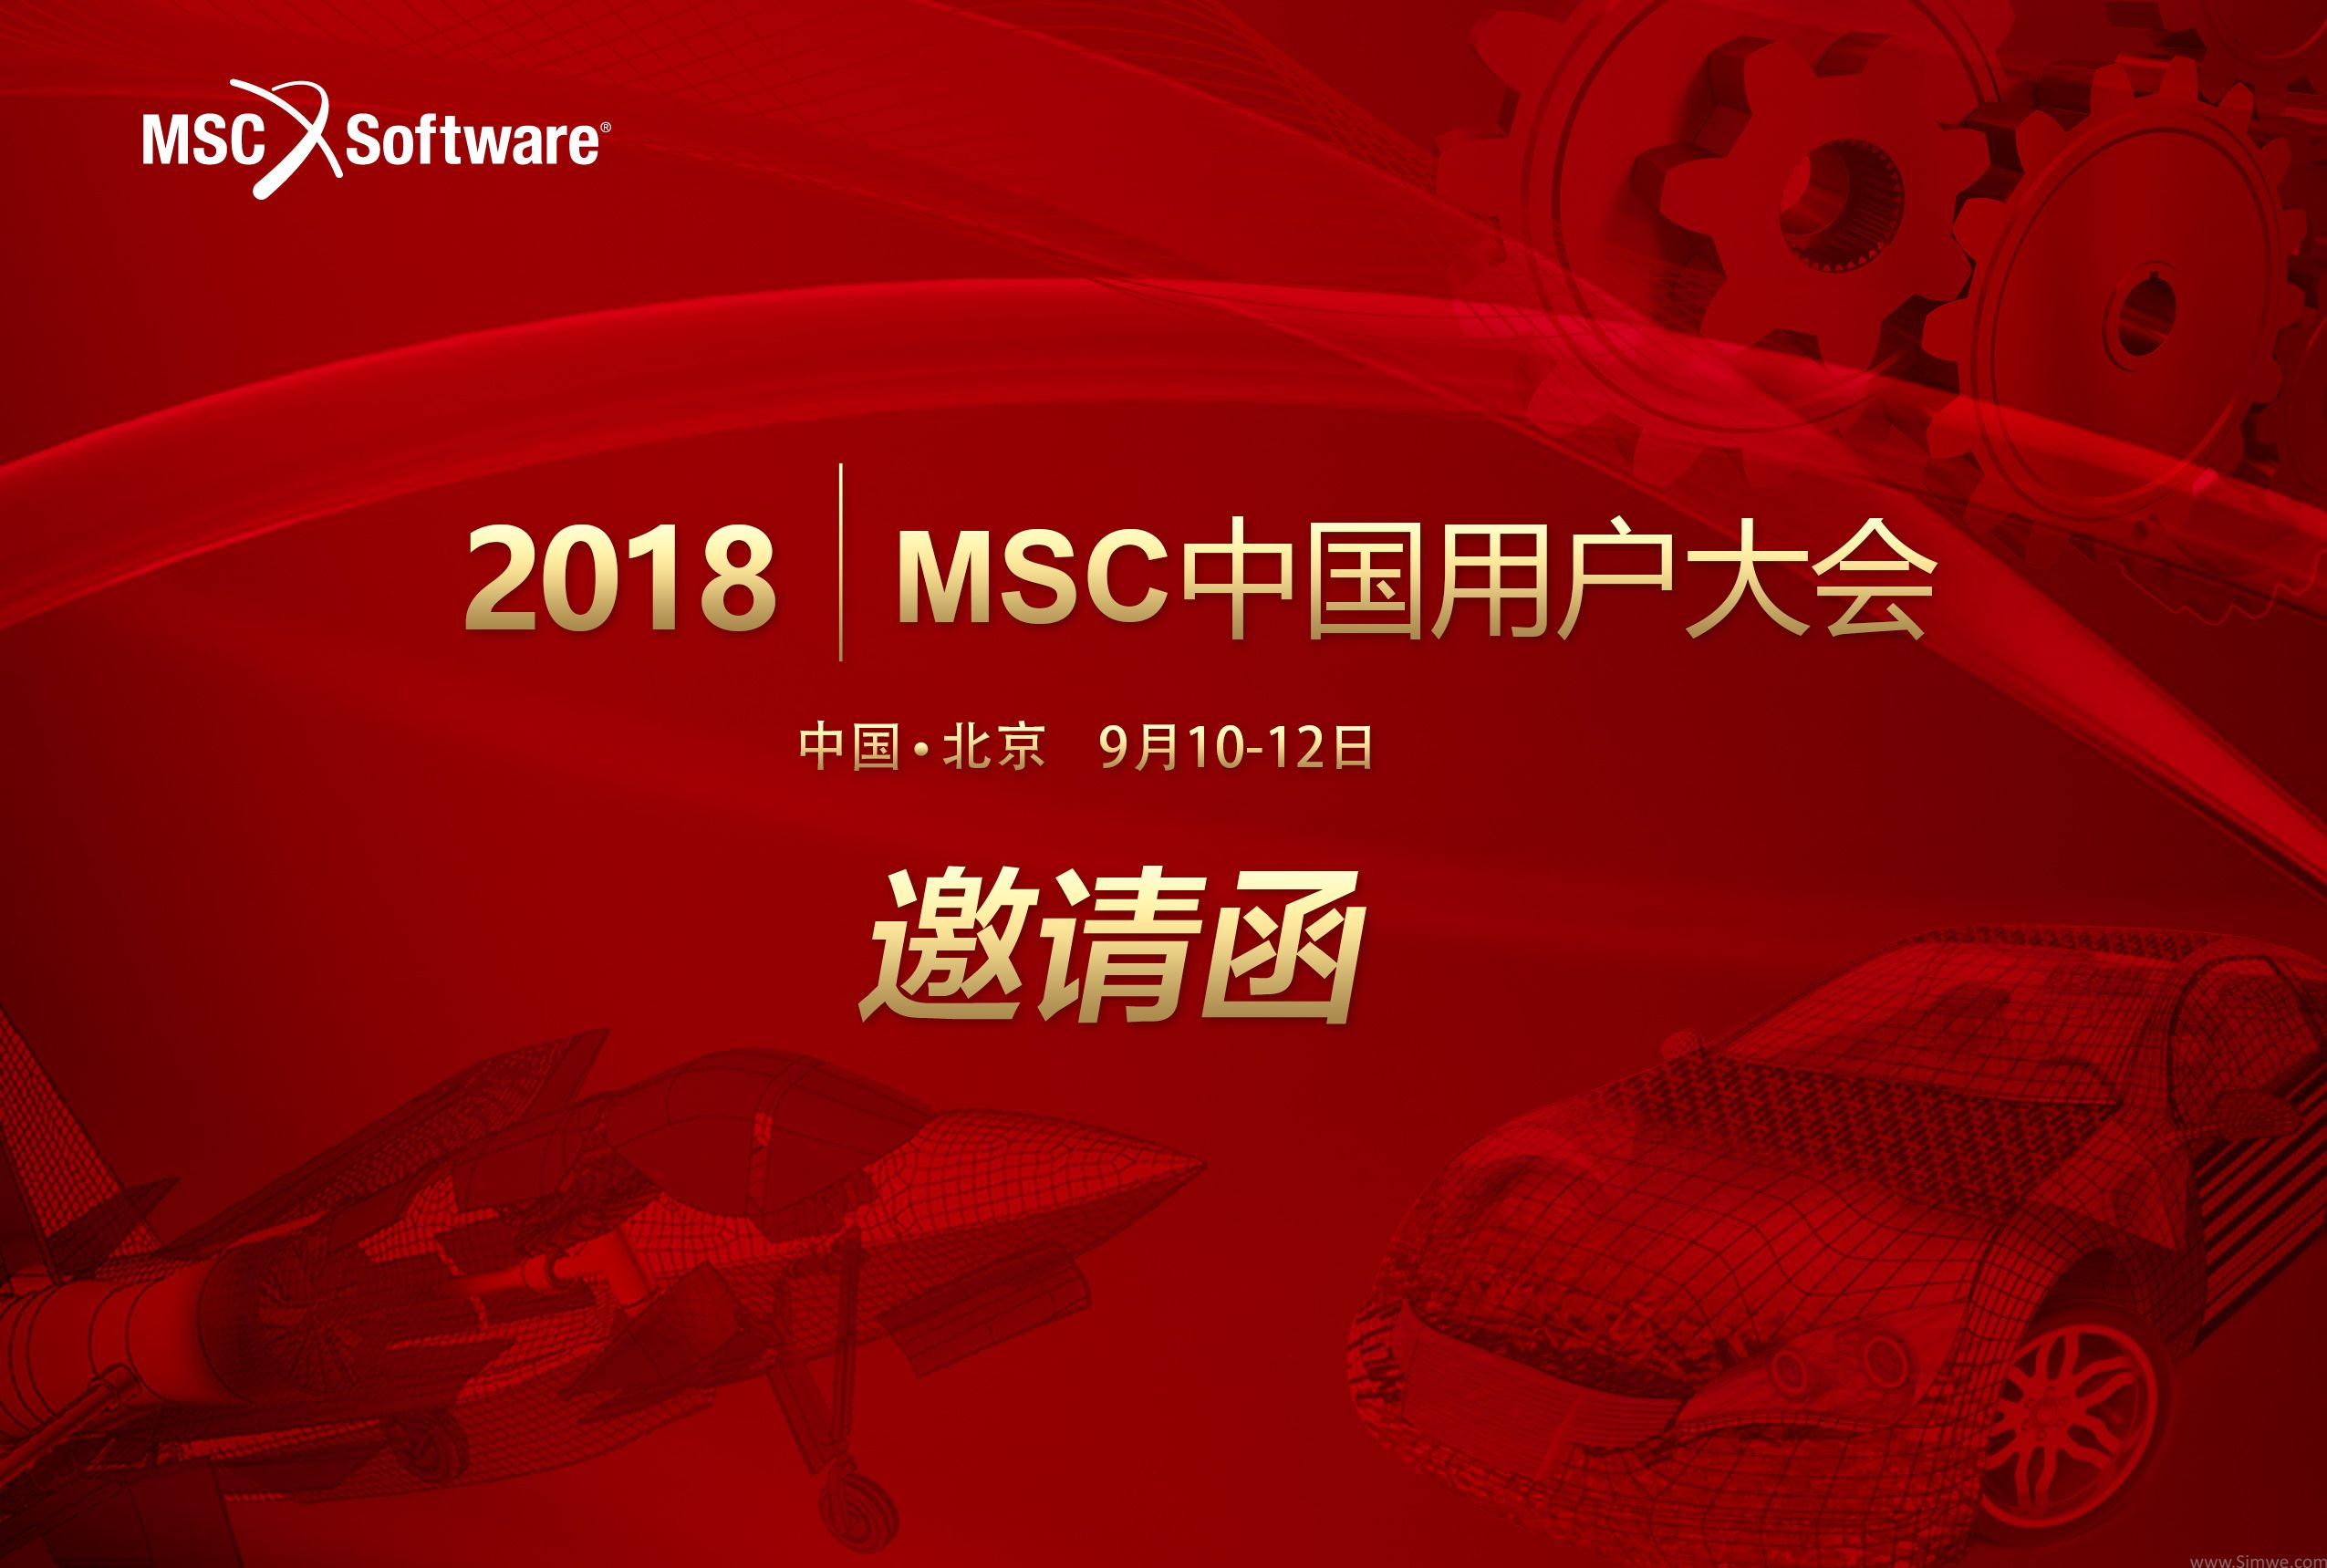 MSC 2018 中国用户大会 | 邀请函